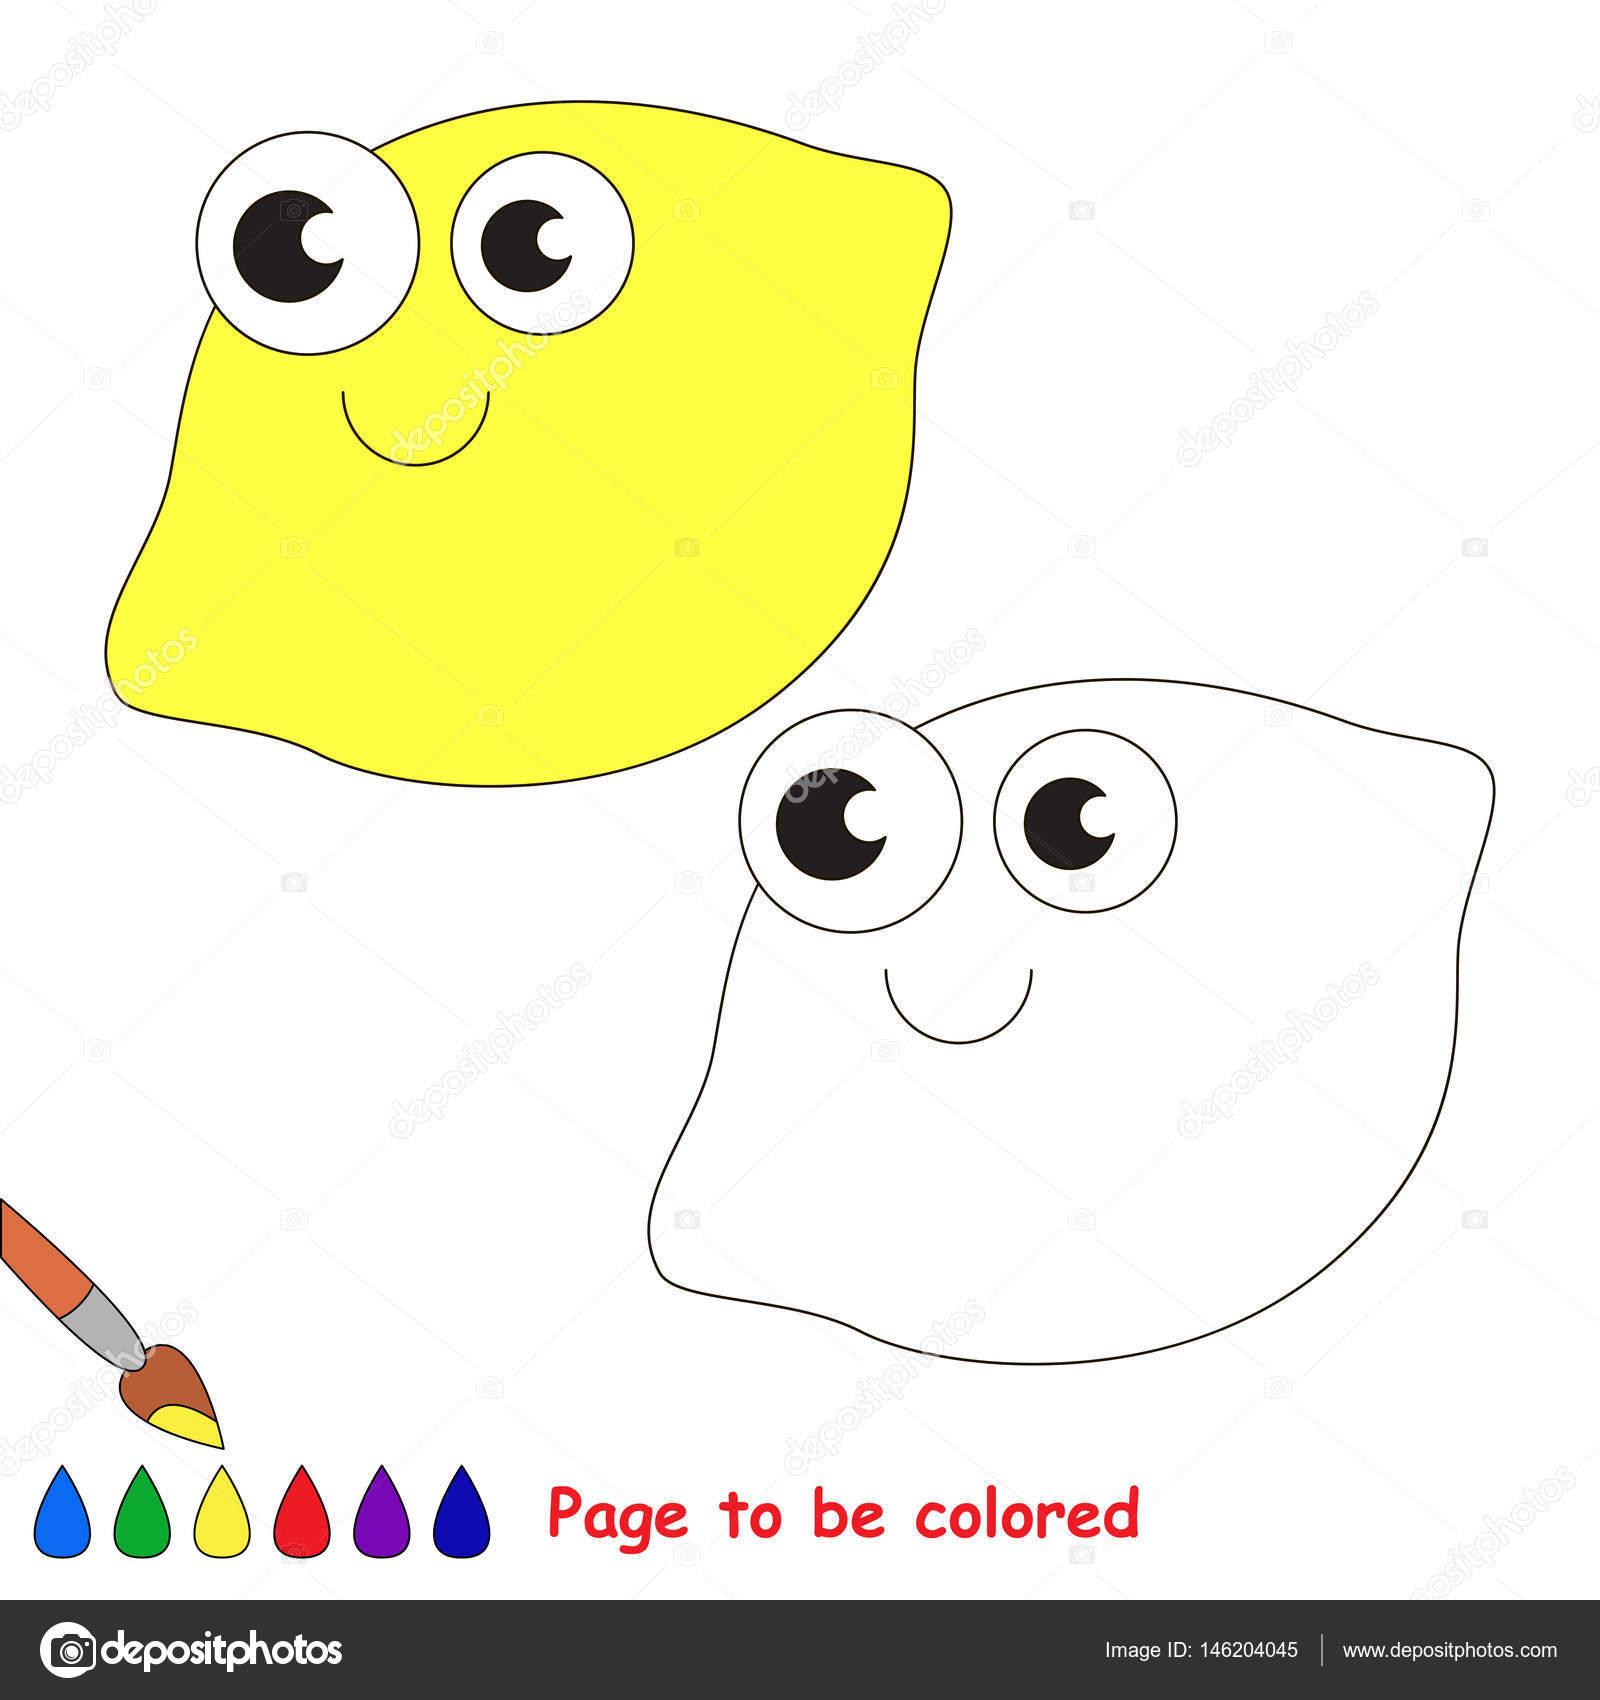 Imágenes Limon Para Pintar Dibujos Animados De Un Limón Página